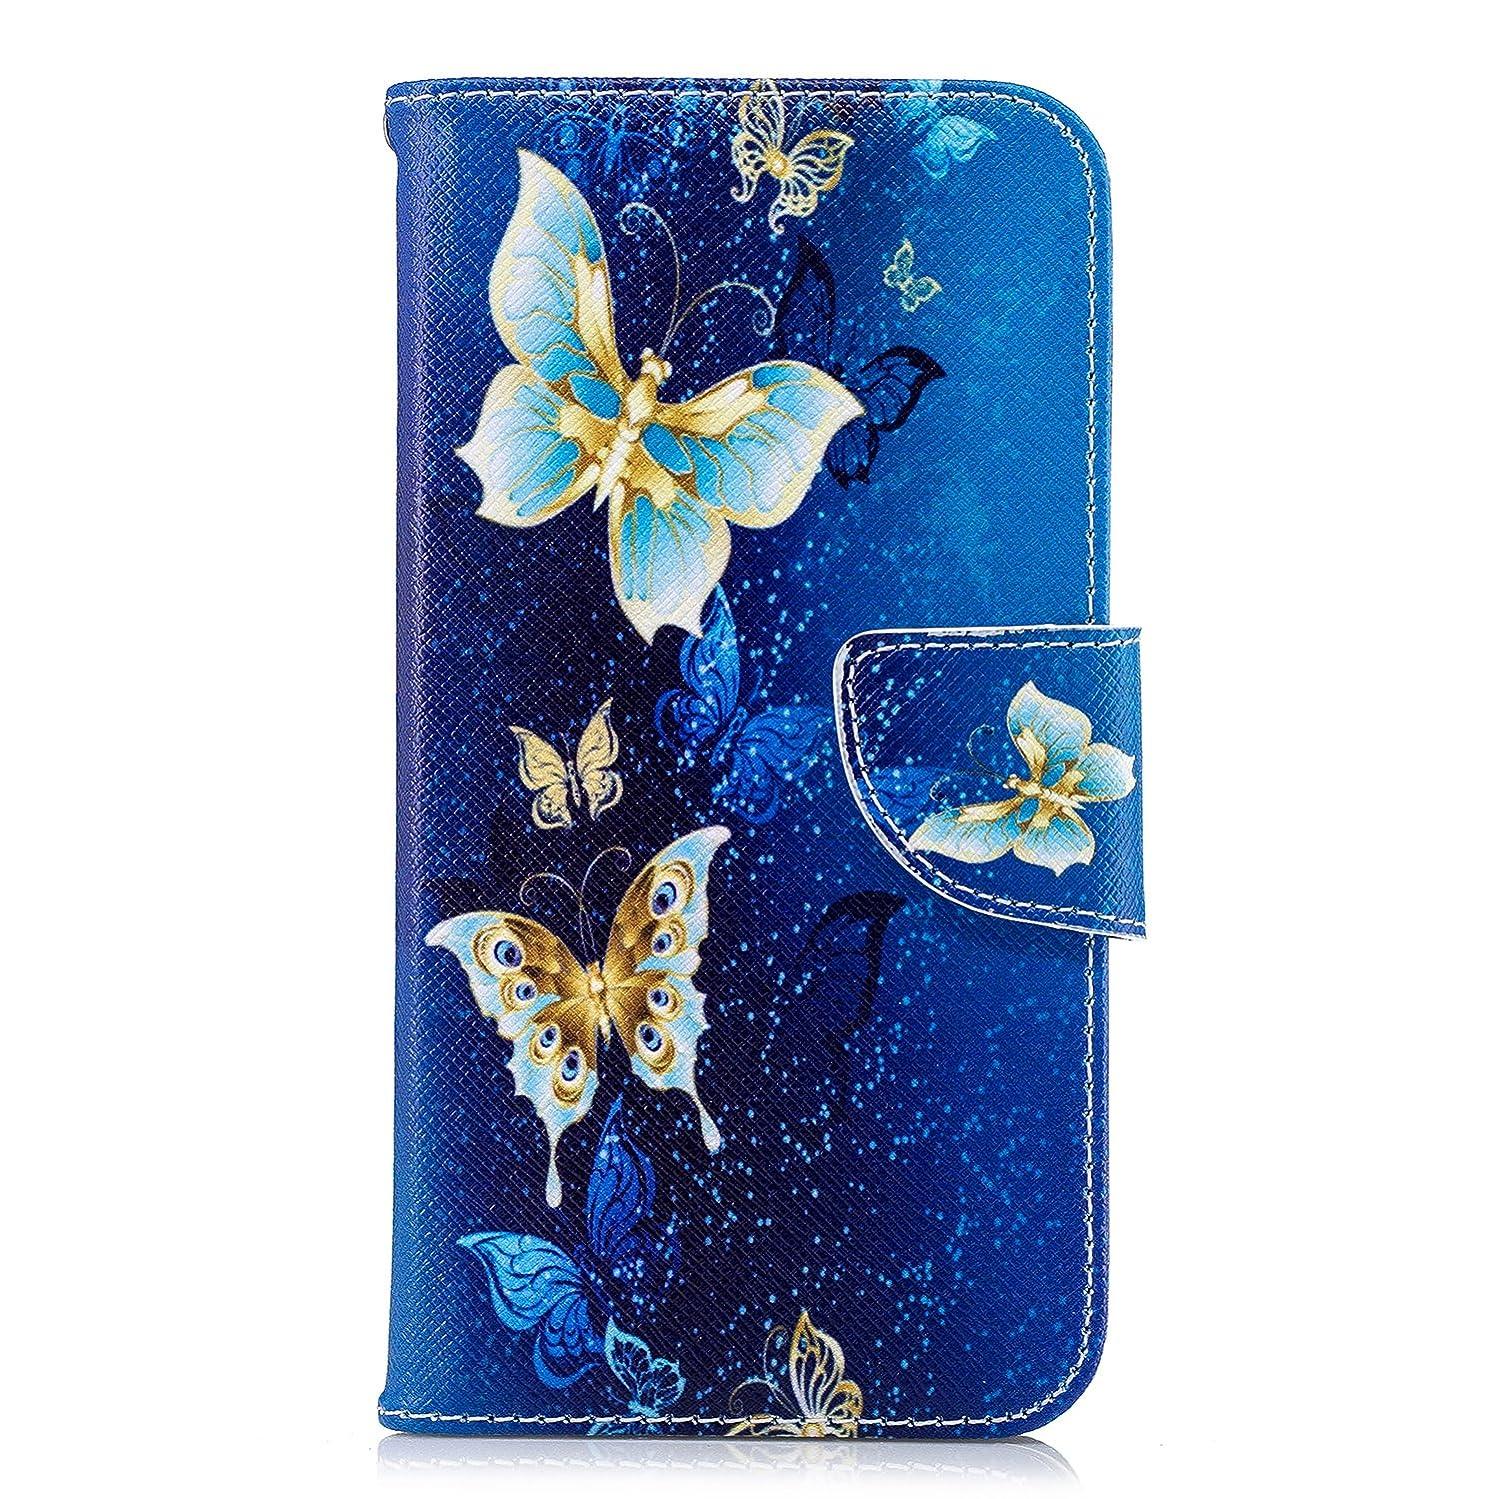 iPhone XR Case, Lomogo Leather Wallet Case with Kickstand Card Holder Shockproof Flip Case Cover for Apple iPhone XR - LOBFE12817#7